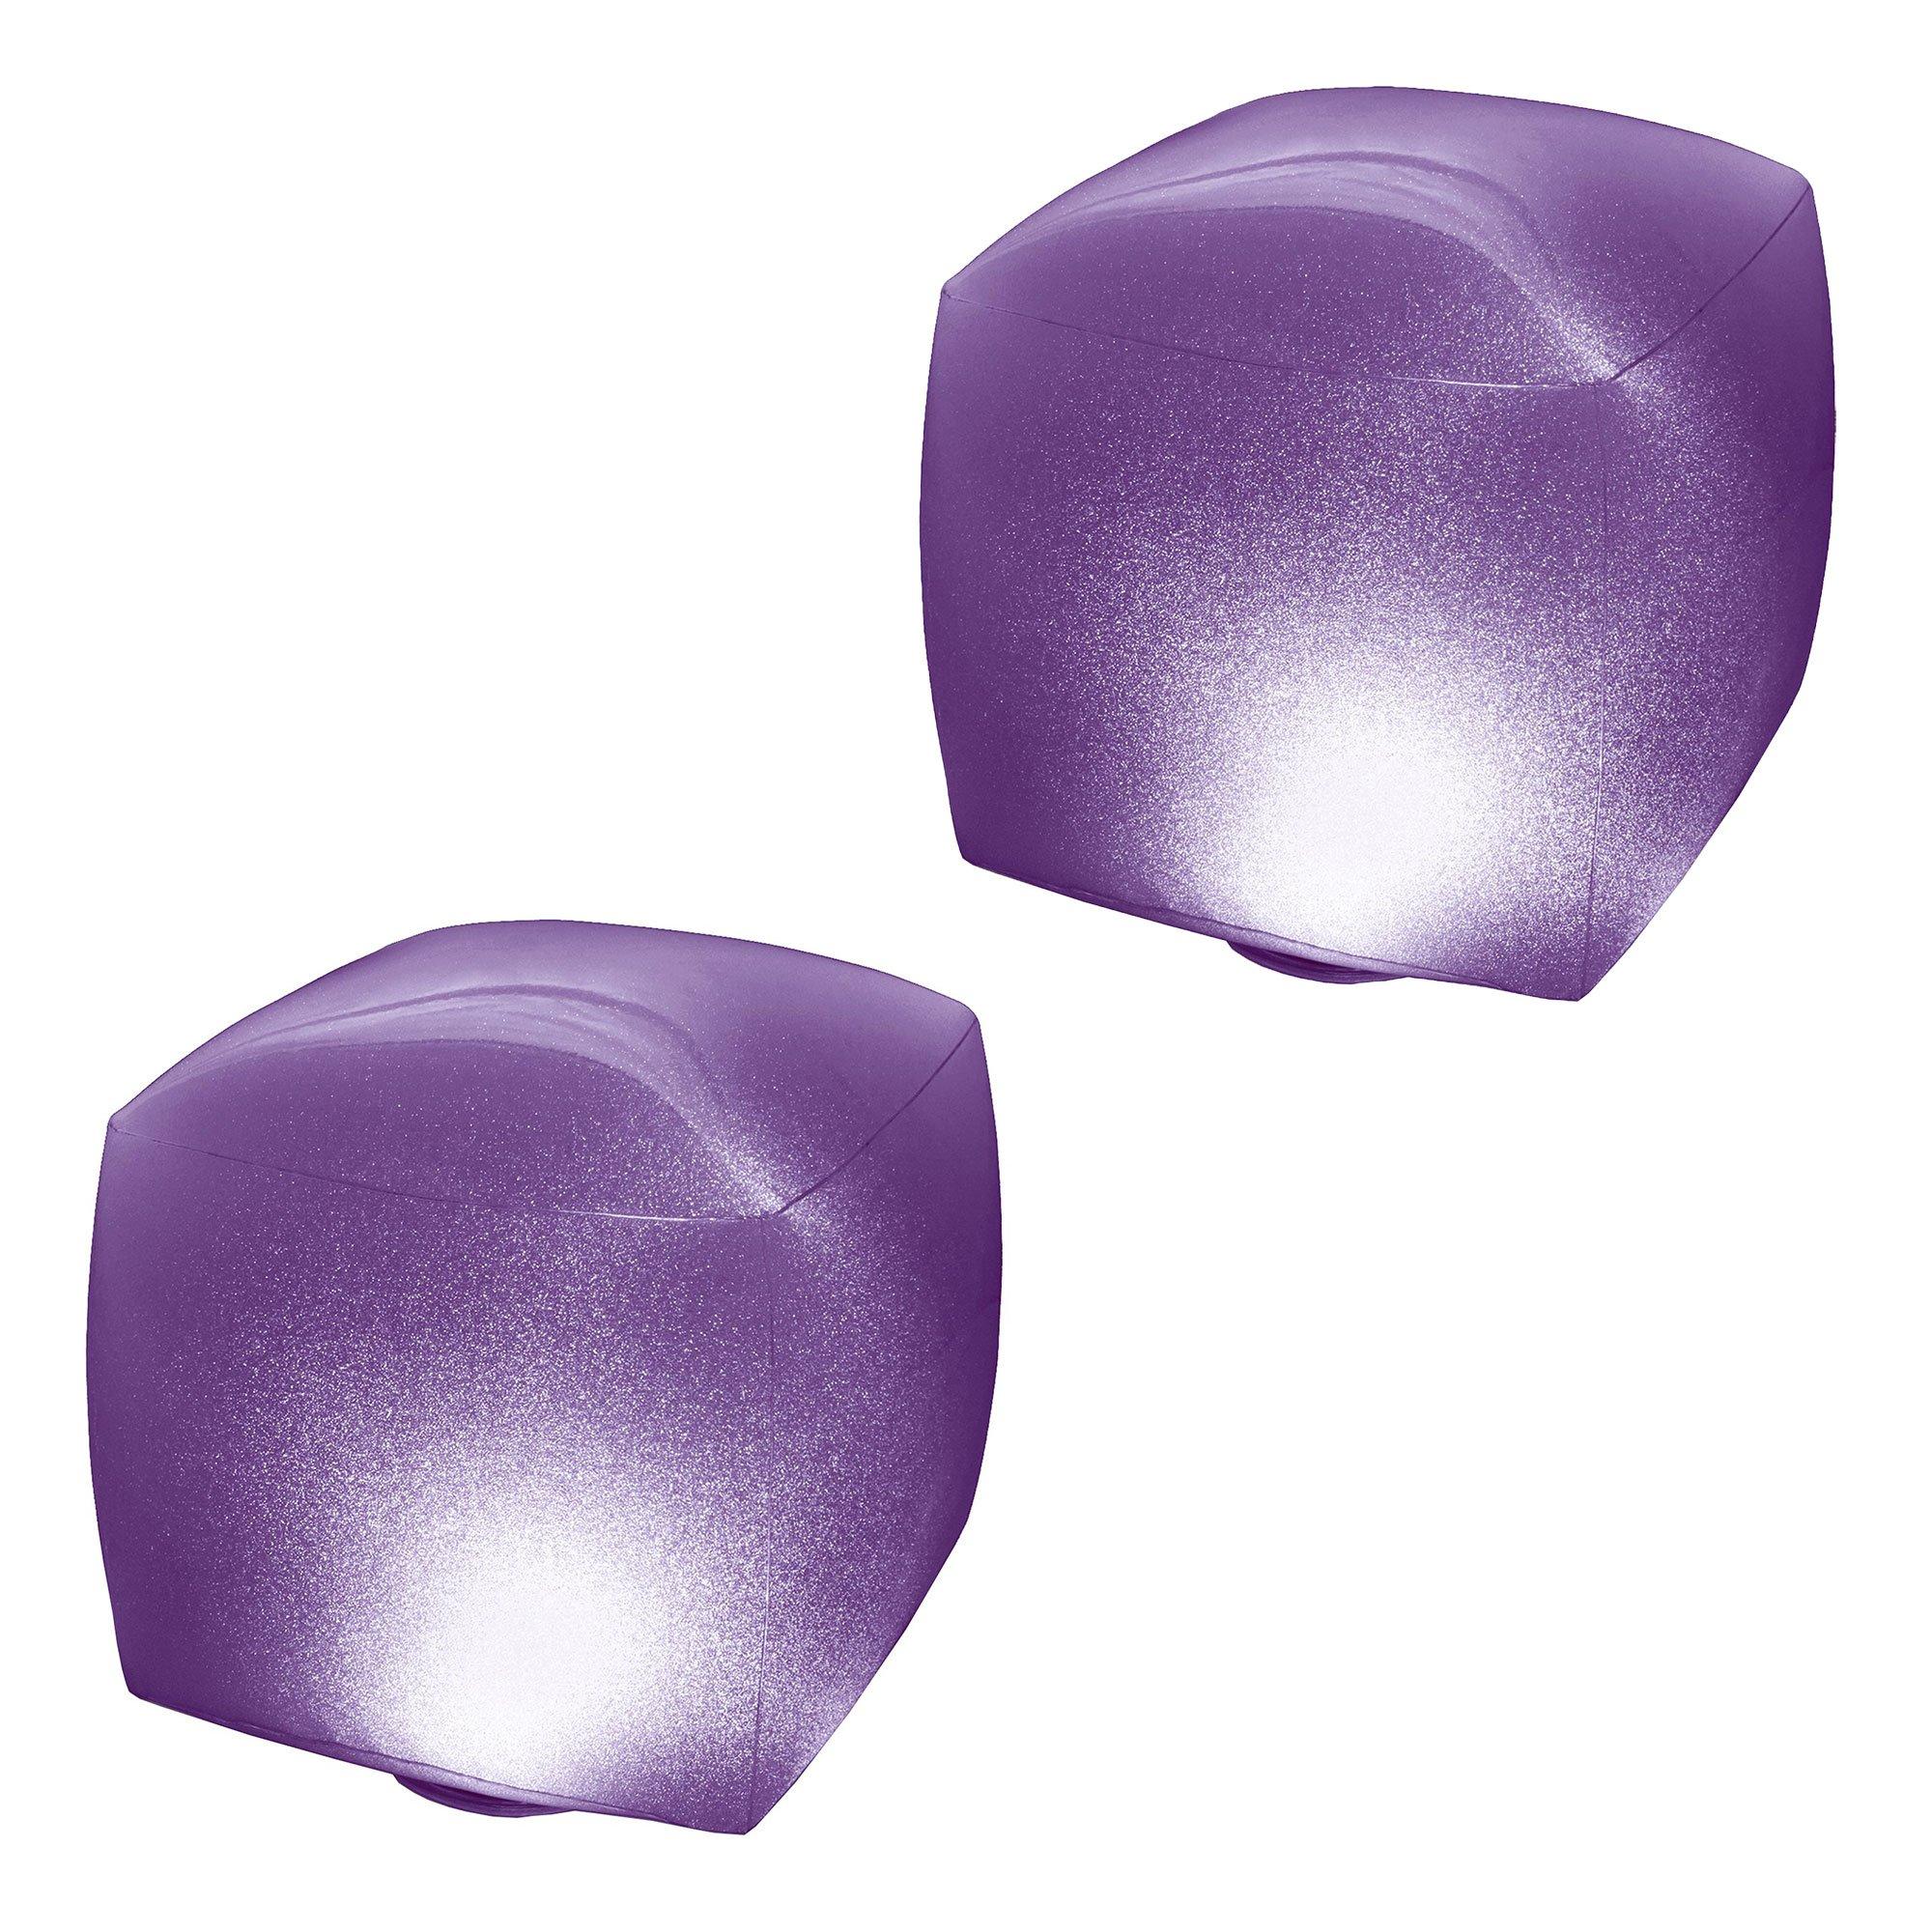 Intex Inflatable Illuminating Multi-Color LED Swimming Pool Cube (2 Pack)